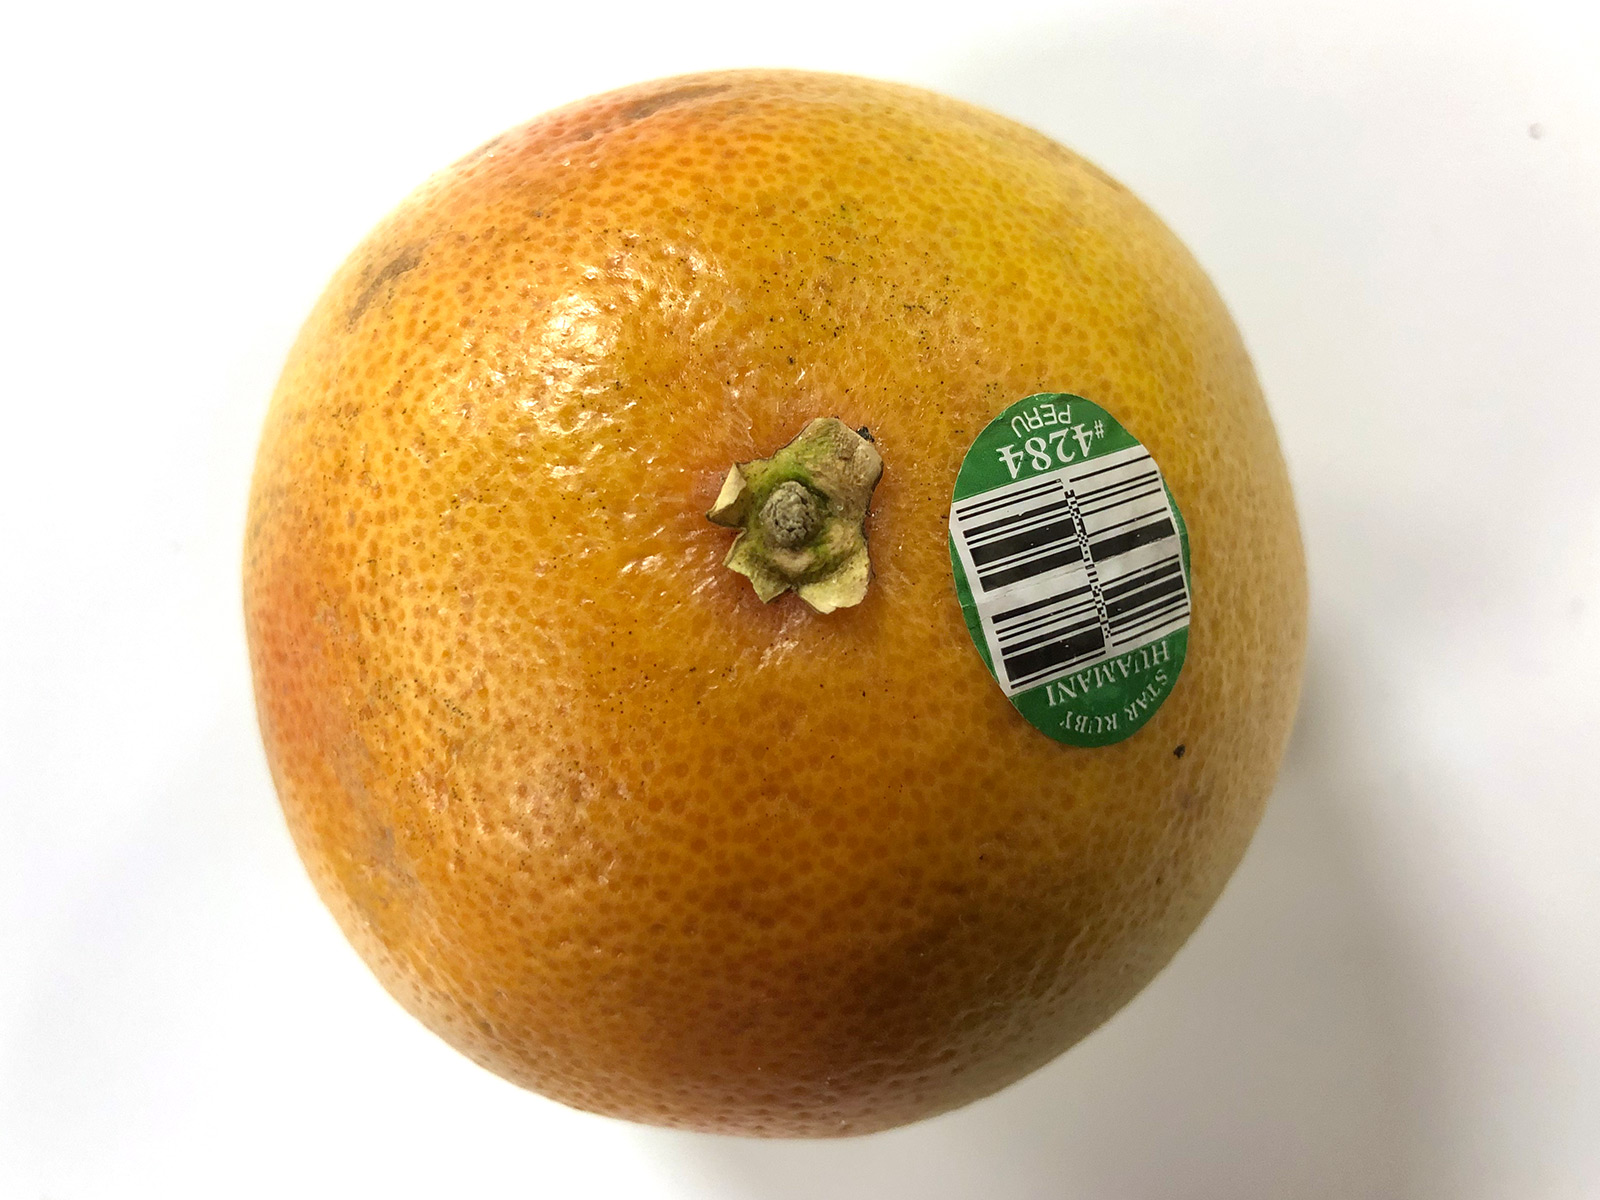 4284-peru-star-ruby-huamani-grapefruit.jpg